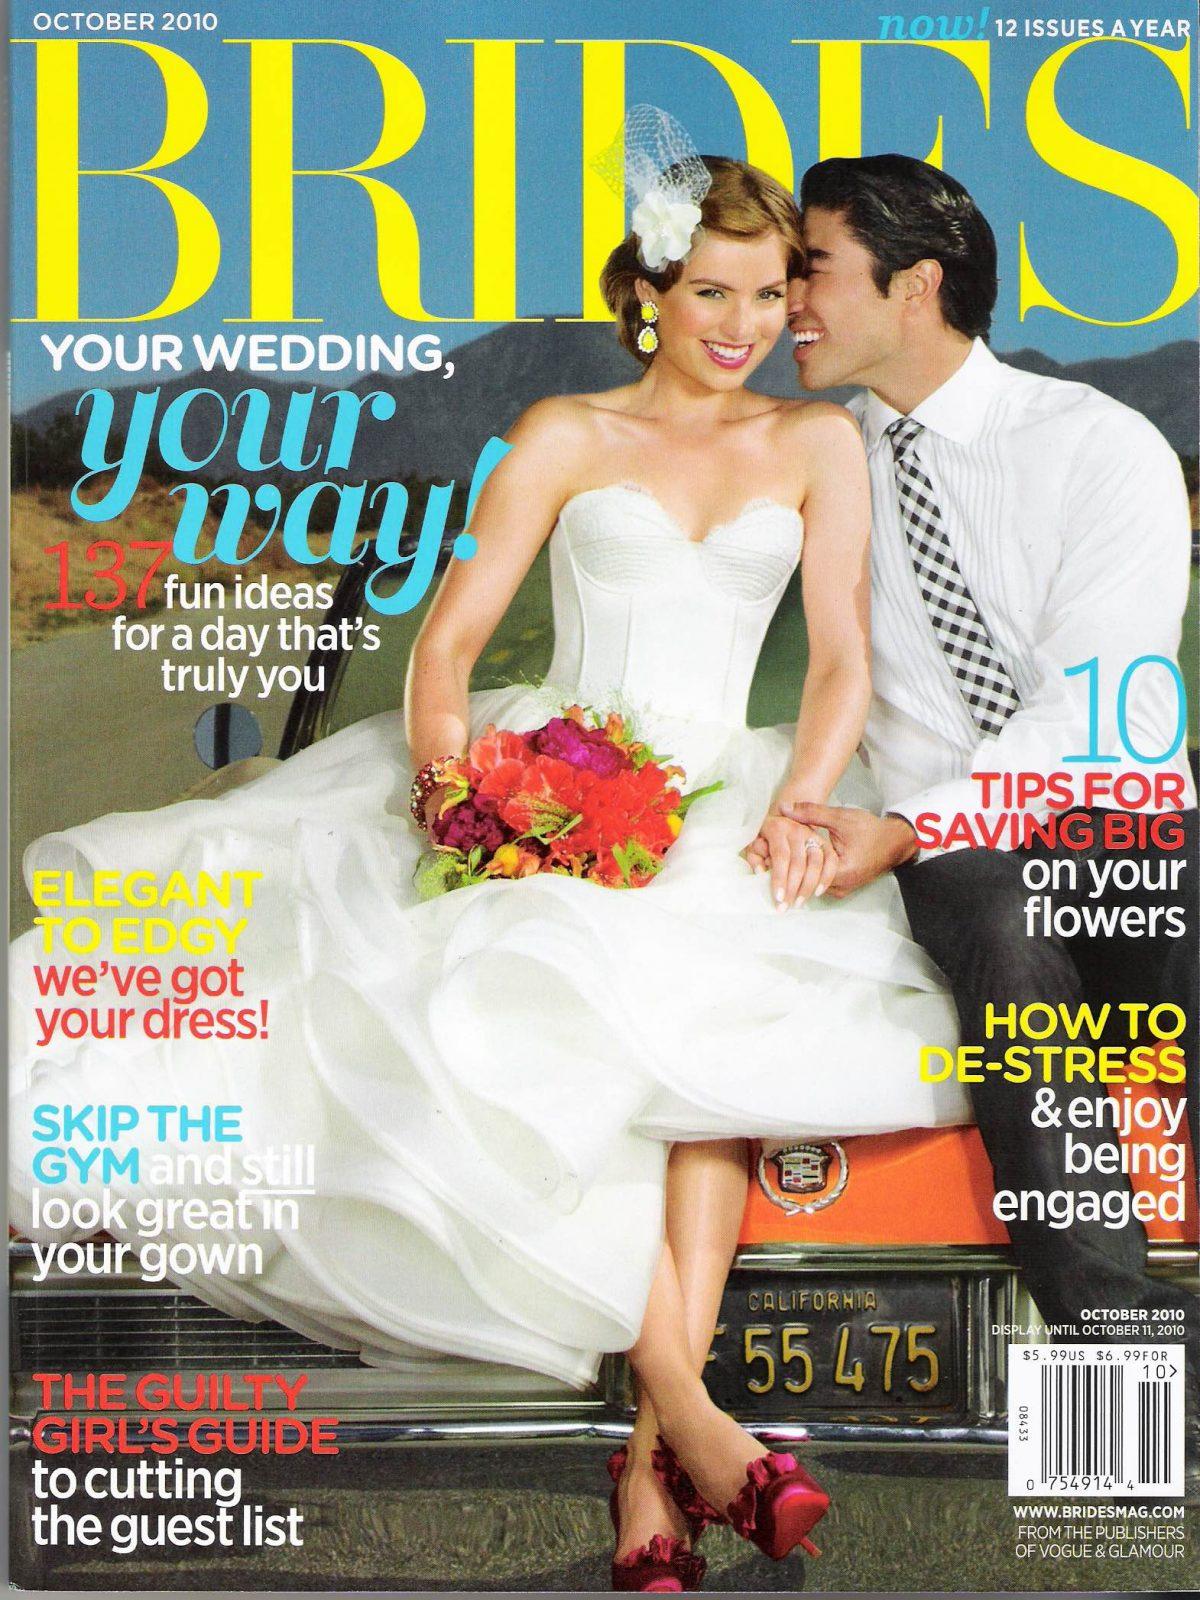 Brides Cover October 2010